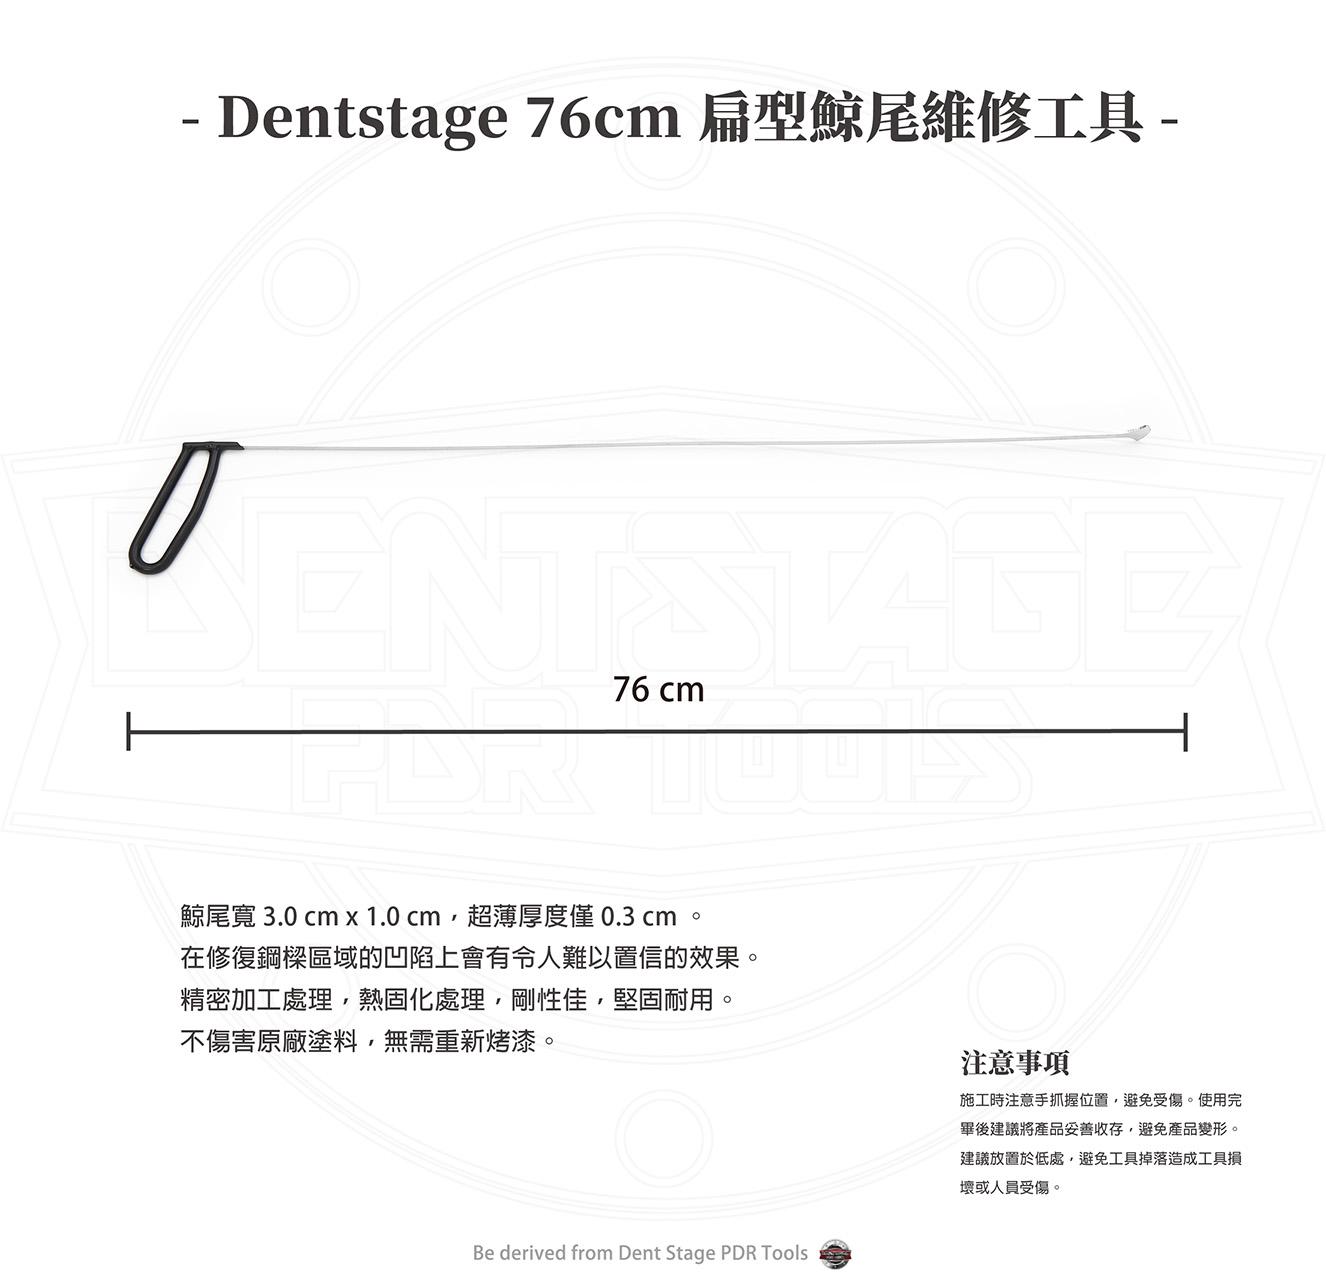 Dentstage 76cm 扁型鯨尾維修工具_02.jpg